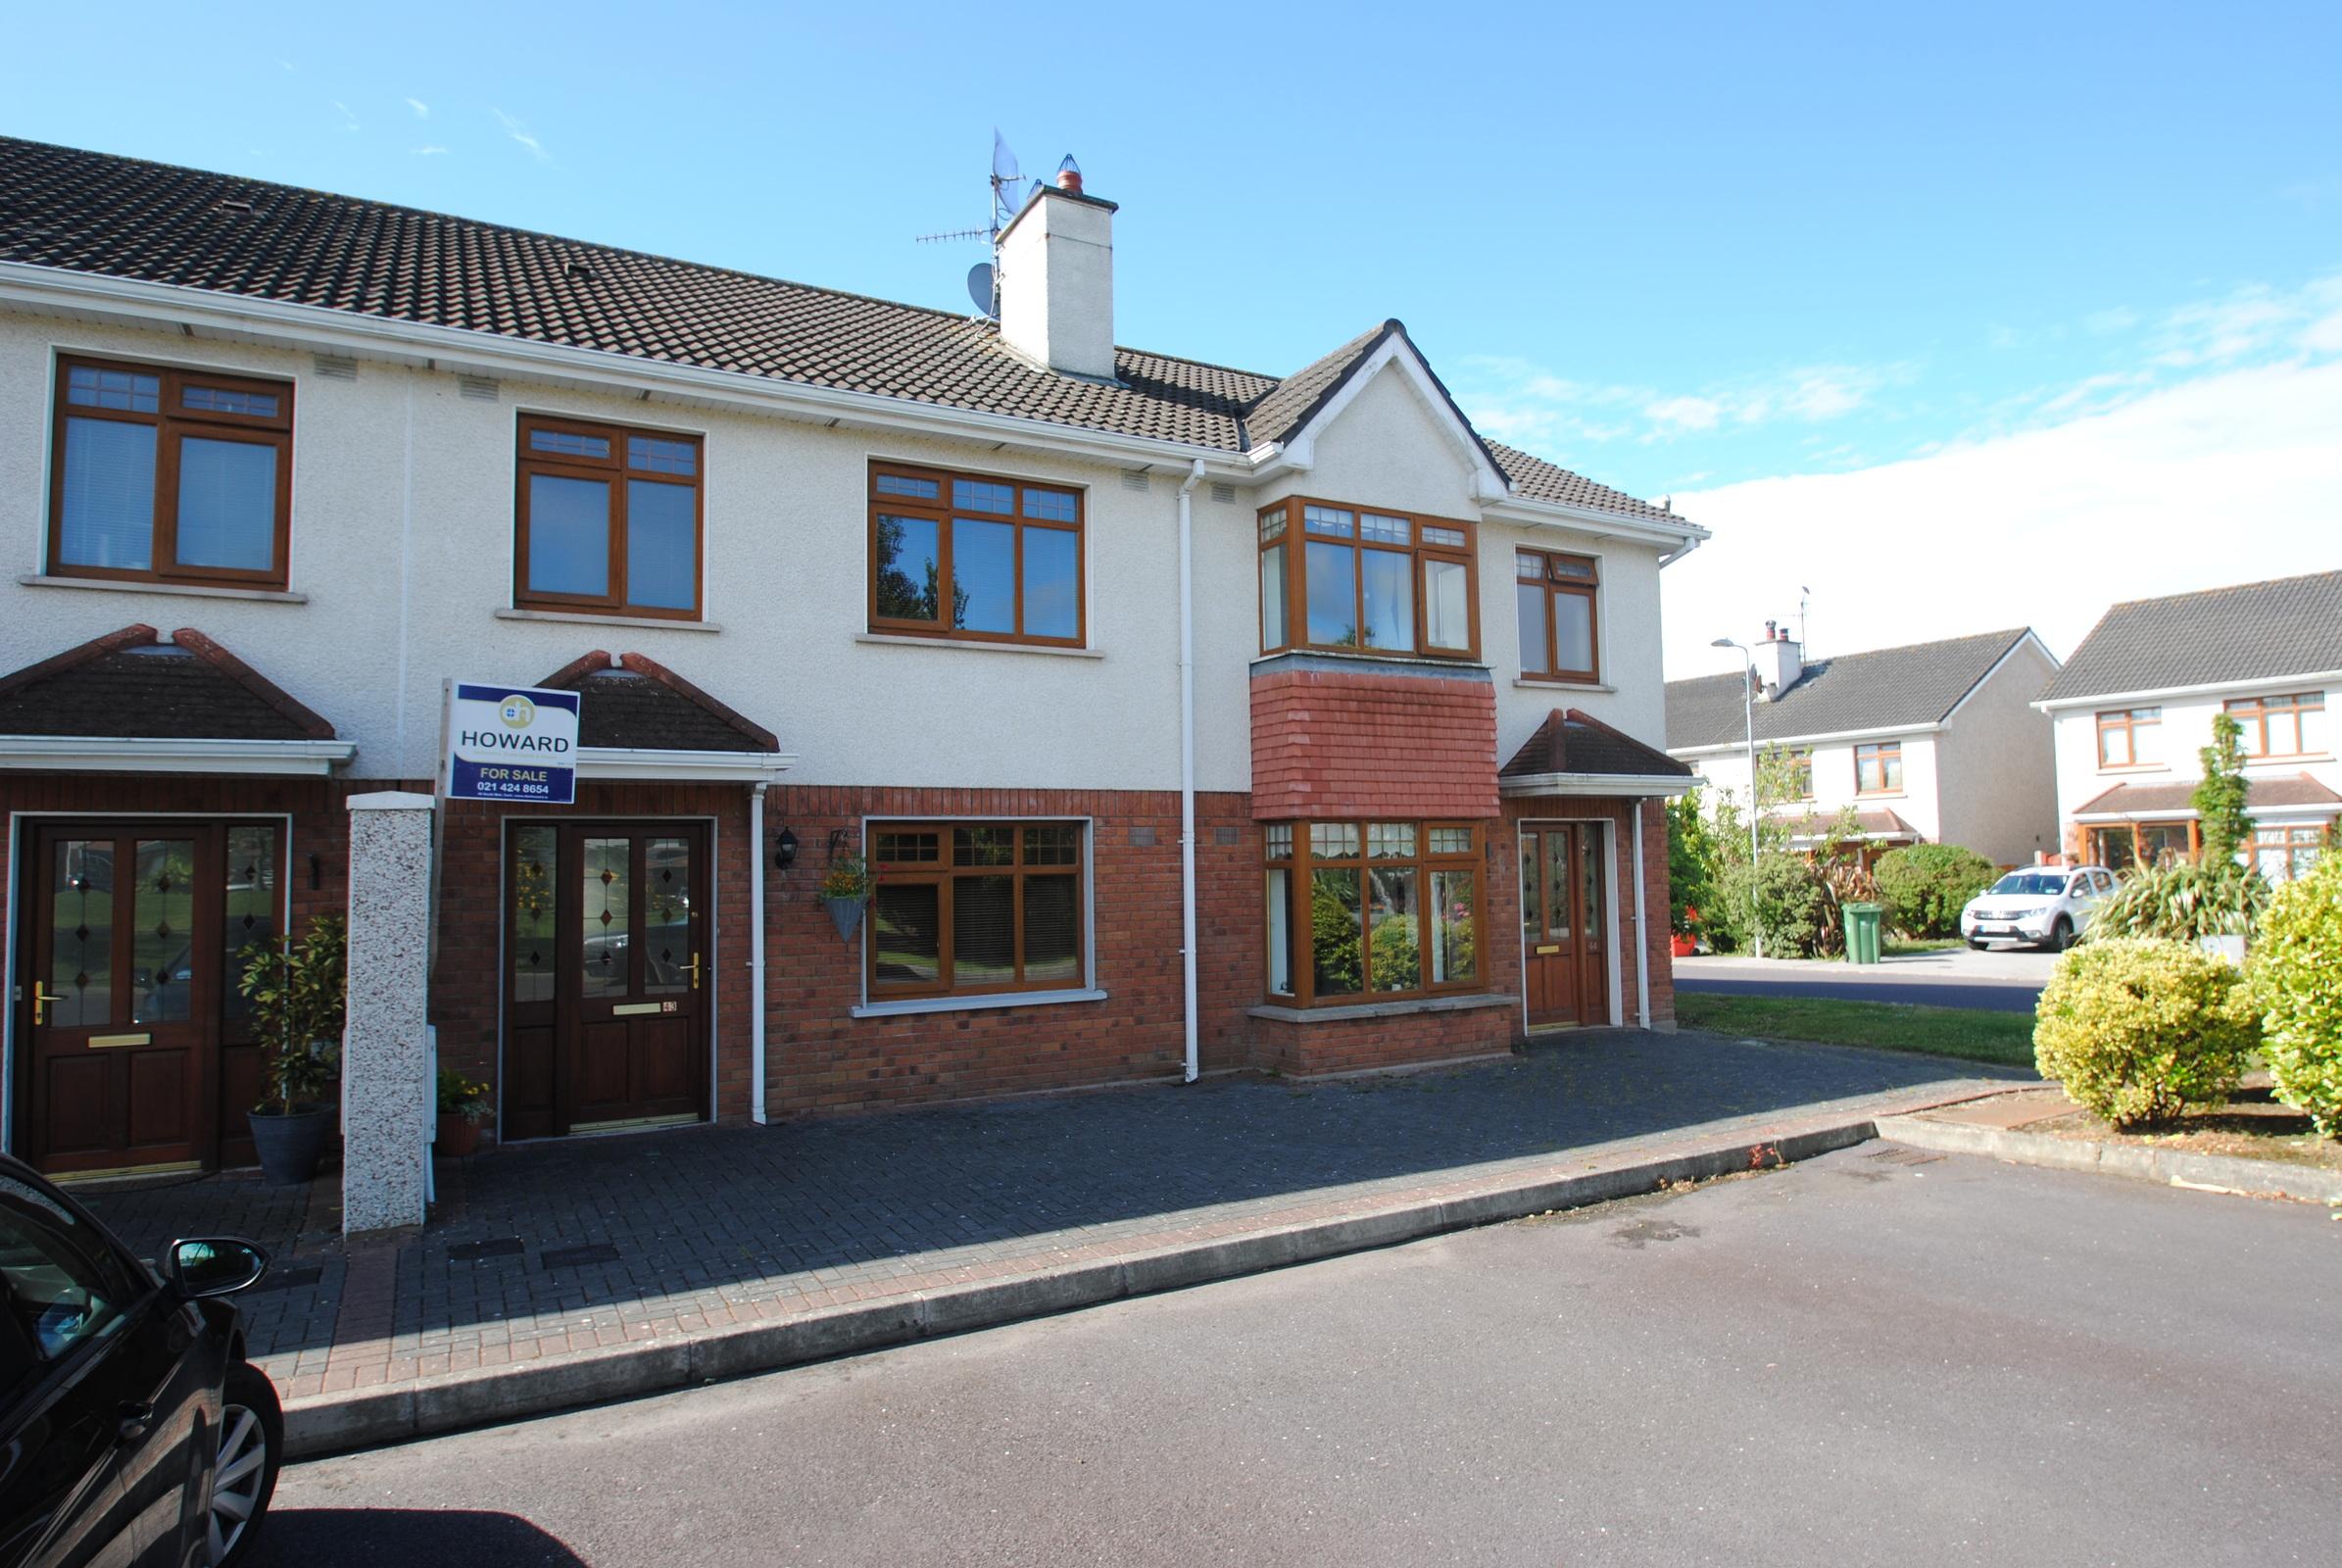 43 Ravensdale, Herons Wood, Carrigaline, Co. Cork